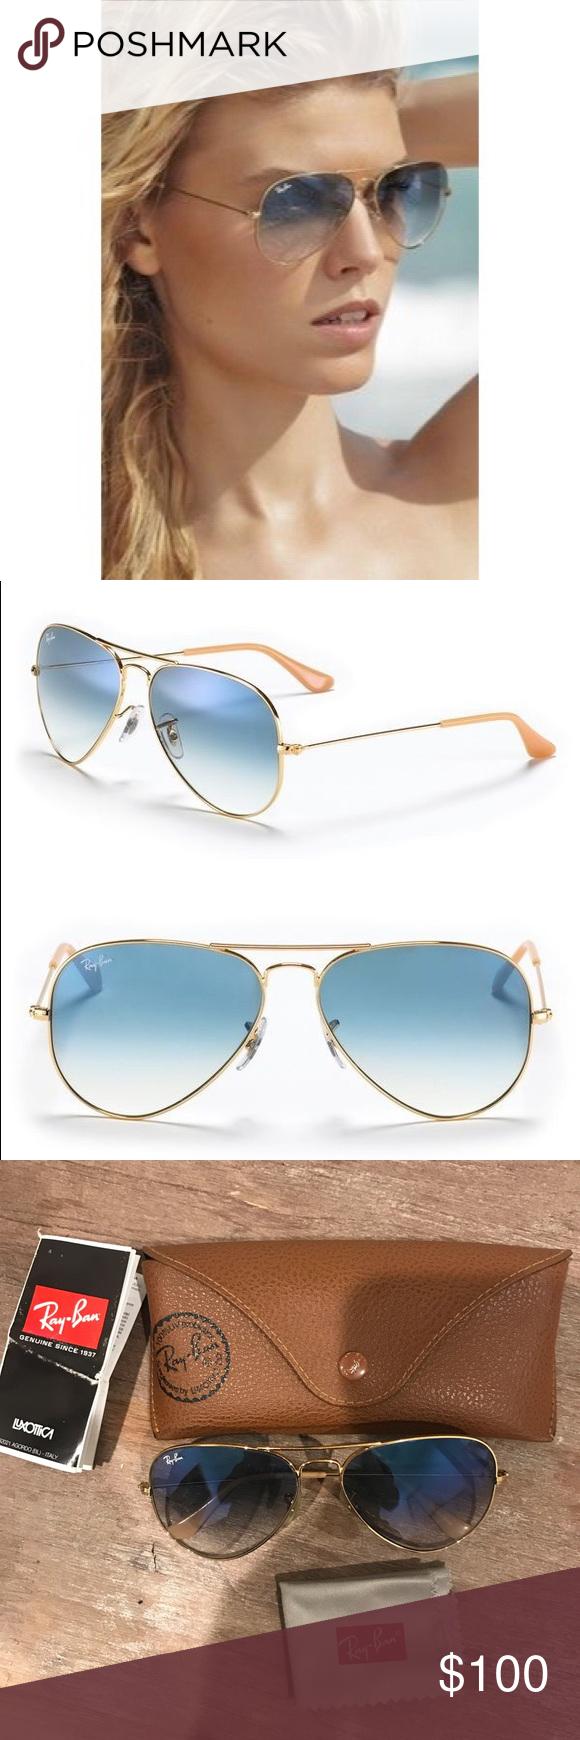 6cbea50193 Ray-Ban Aviators AVIATOR GRADIENT FRAME:Gold LENSES:light blue gradient Ray- Ban Accessories Sunglasses